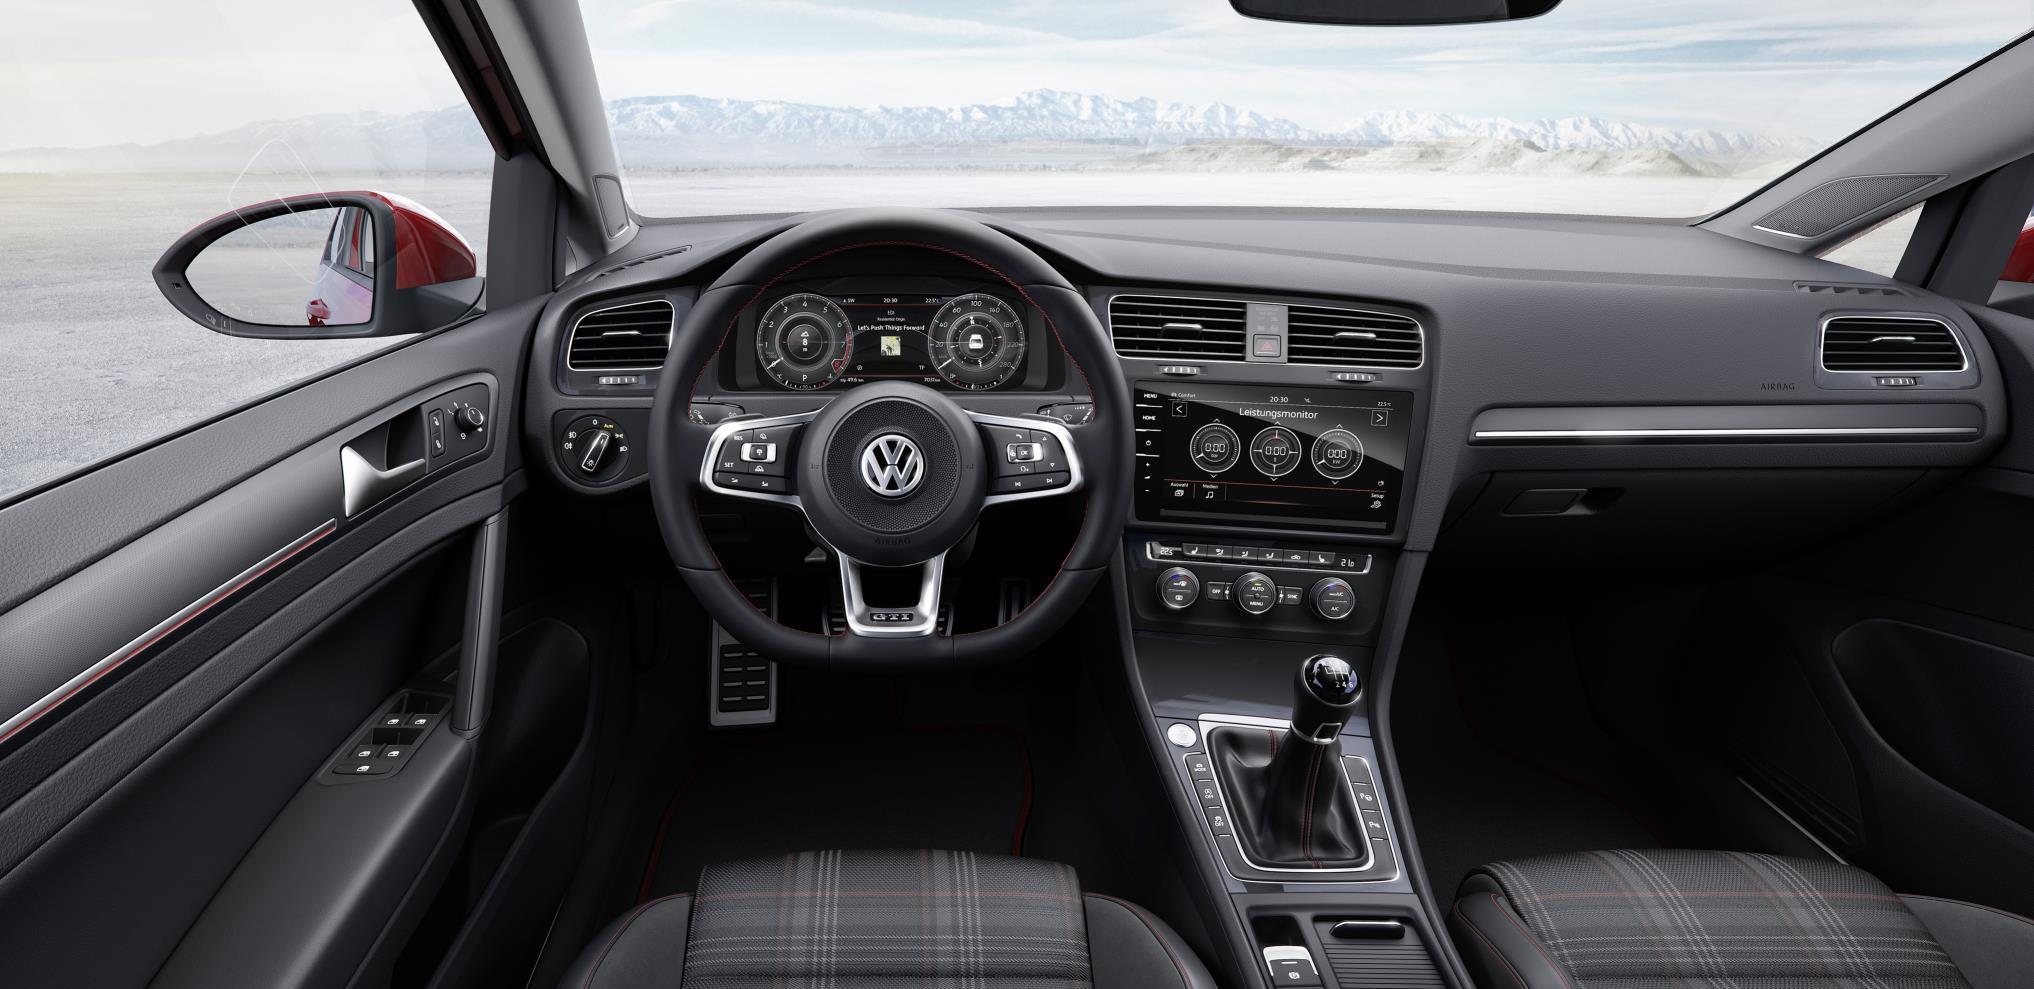 volkswagen_golf_gti_2017_interior.jpg